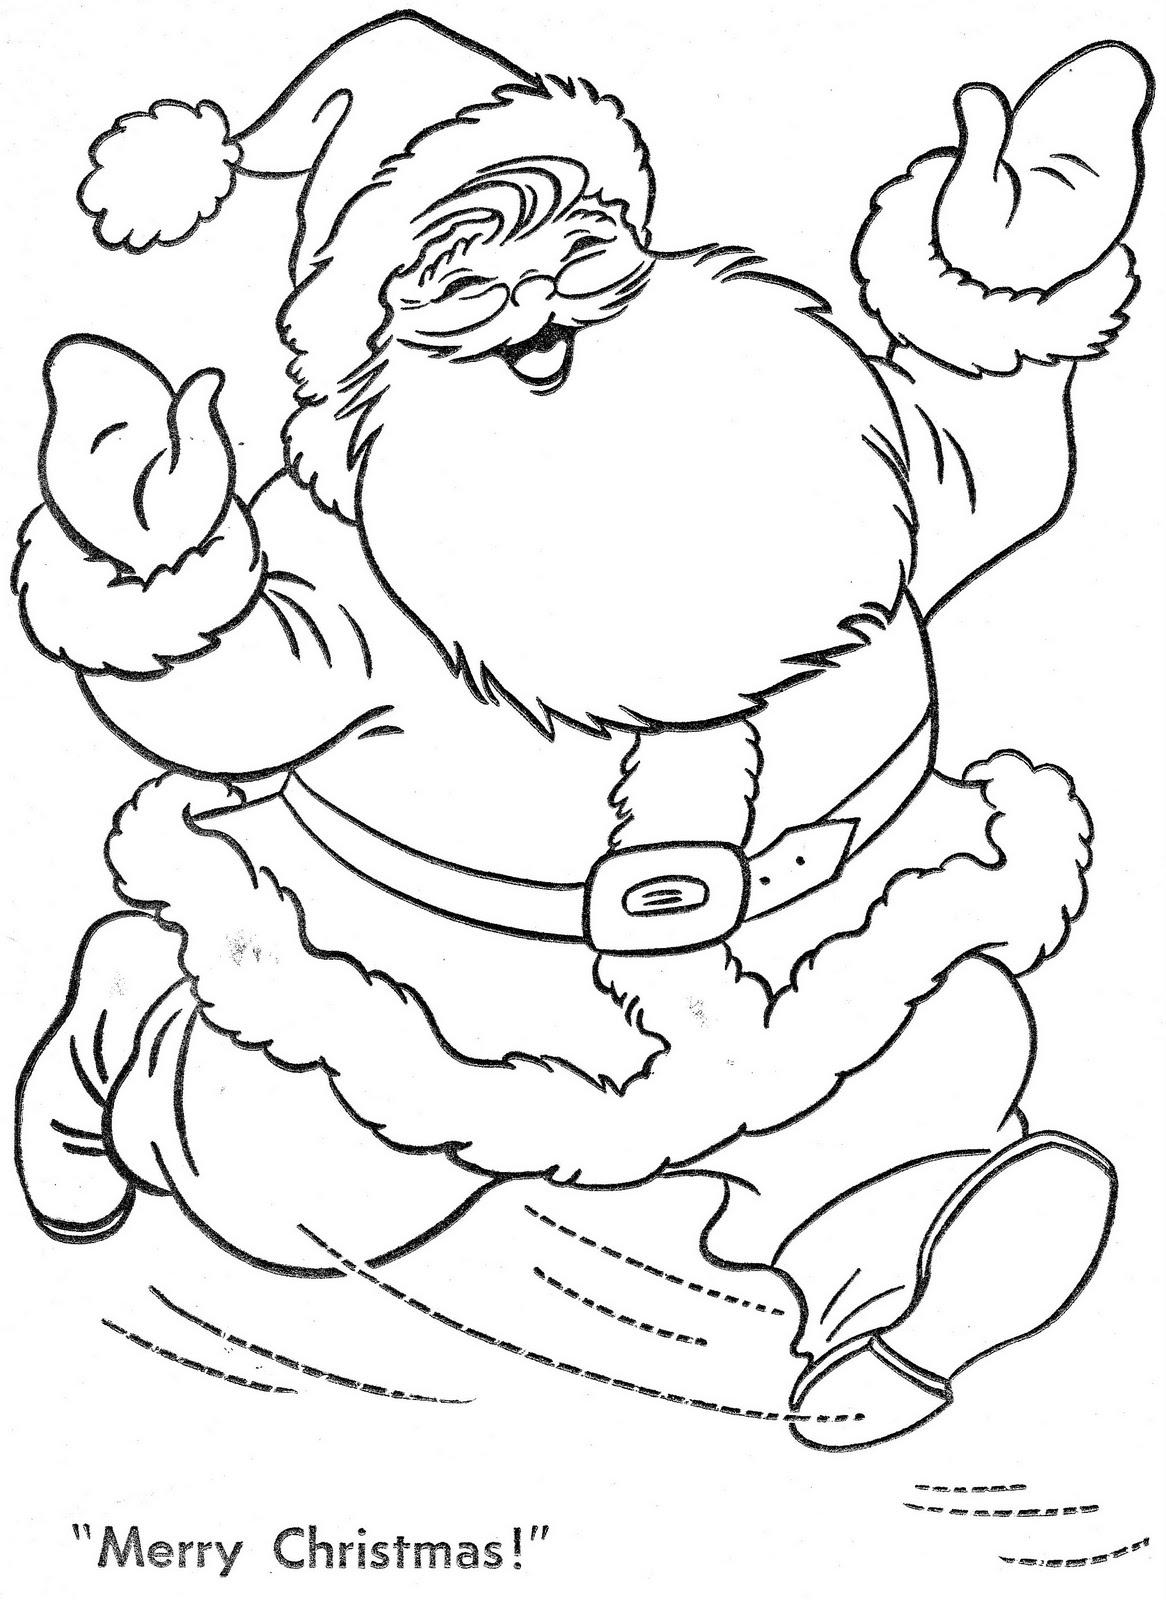 30 Desenhos De Papai Noel Para Colorir E Imprimir Online Cursos